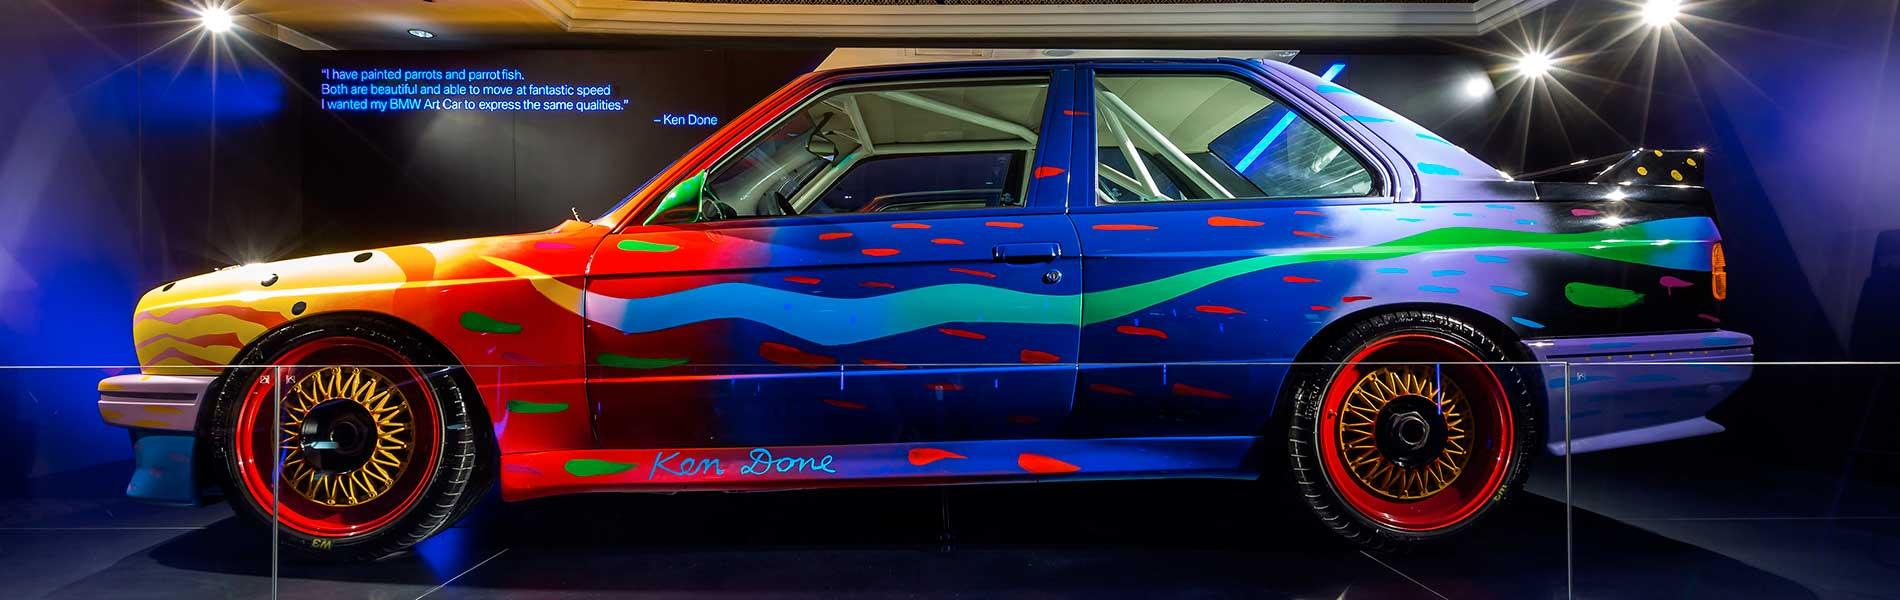 Ken Done - BMW Art Car #9 - Immagine BMW Group